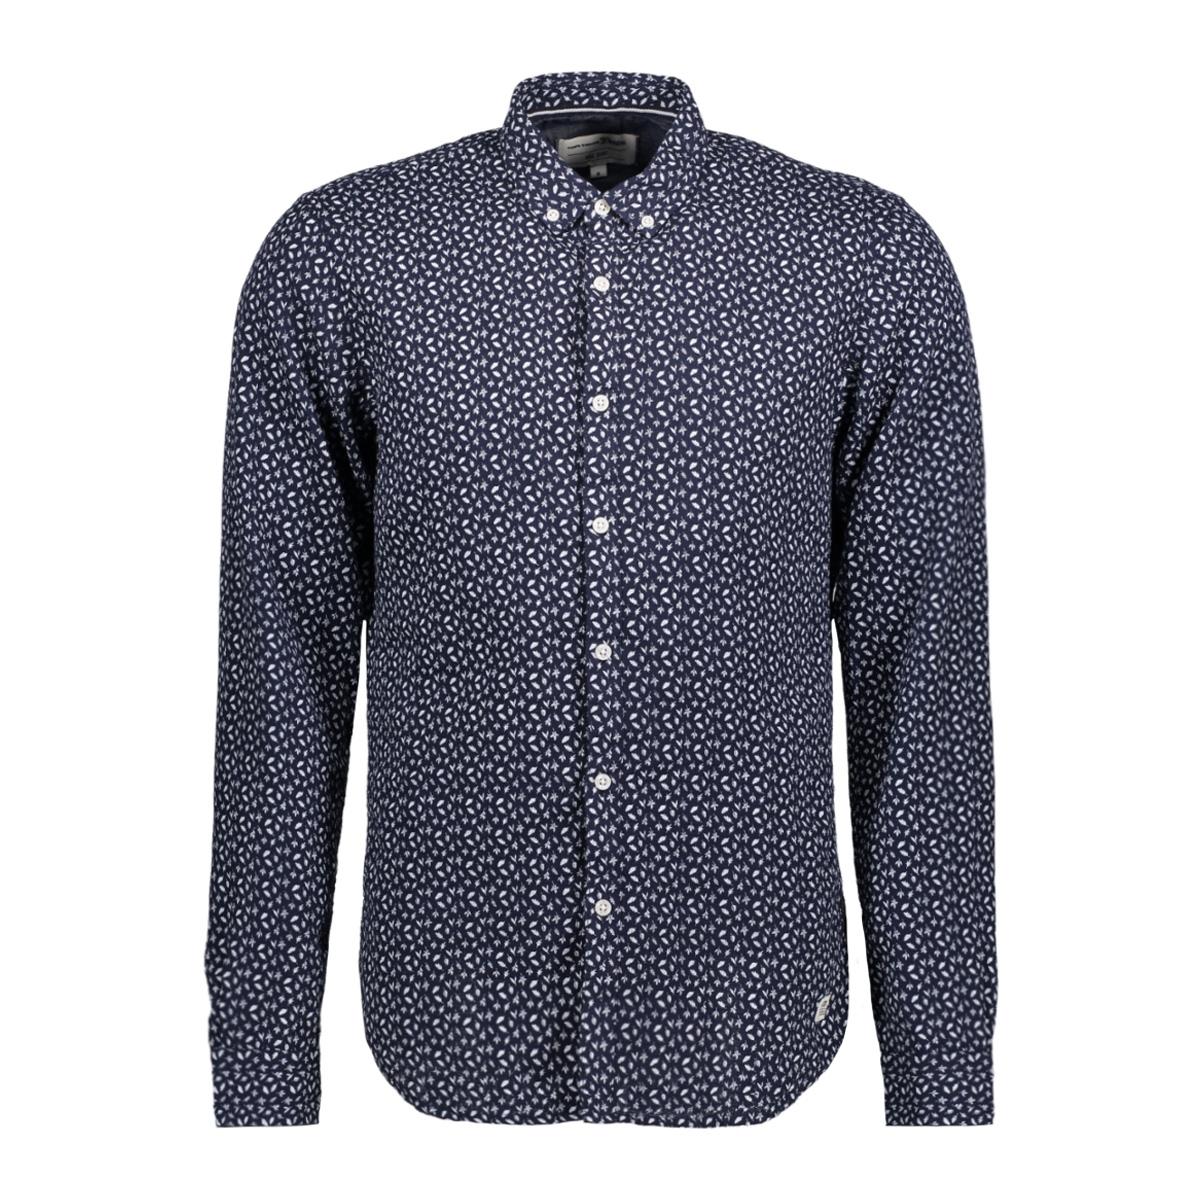 2055068.00.12 tom tailor overhemd 1000